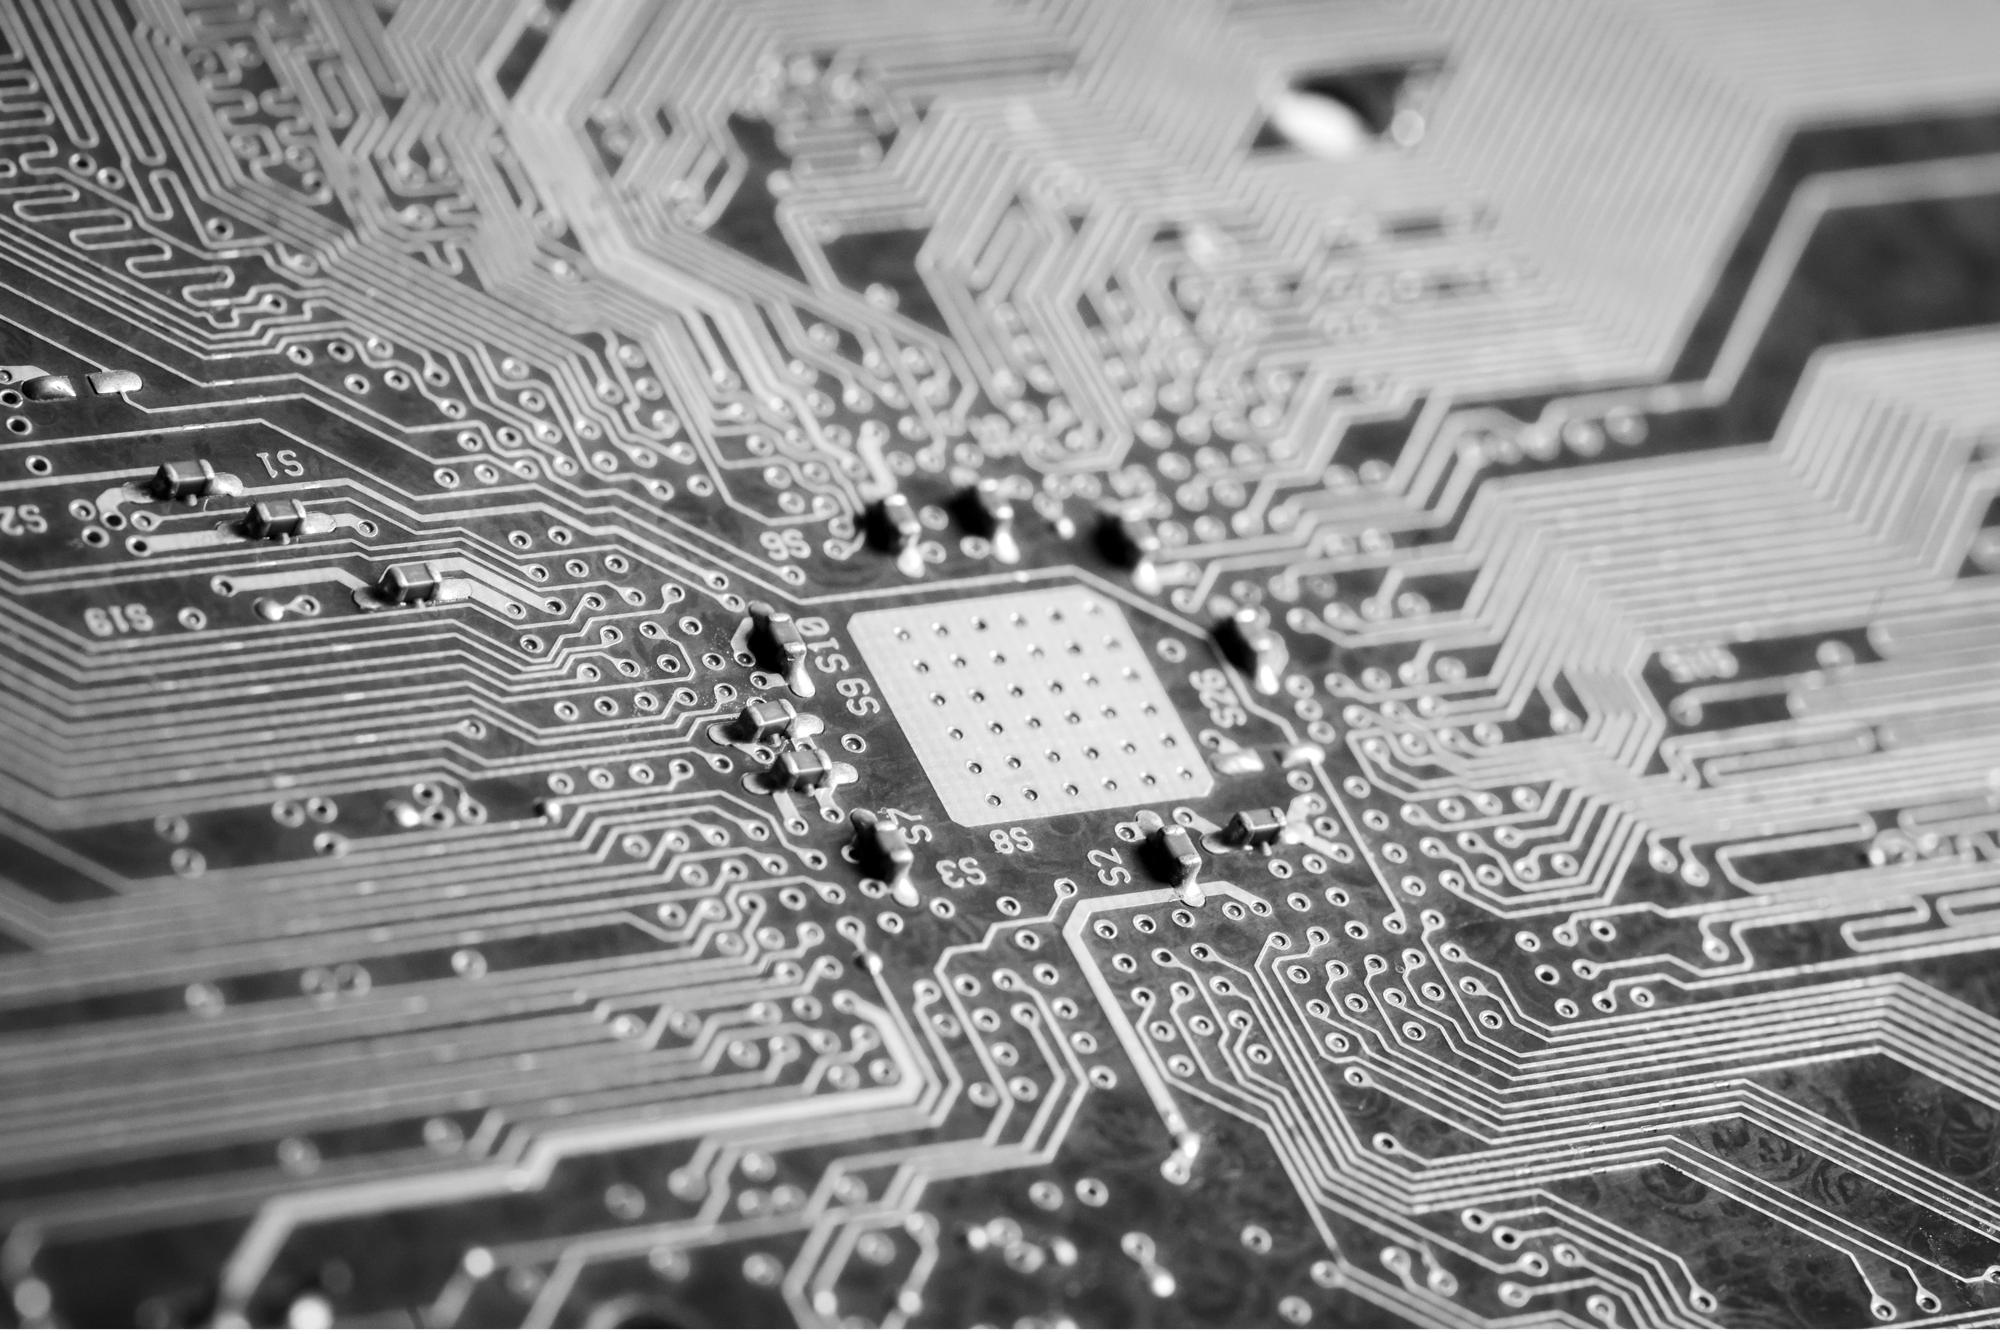 circuit-board-closeup-P2999JN-1